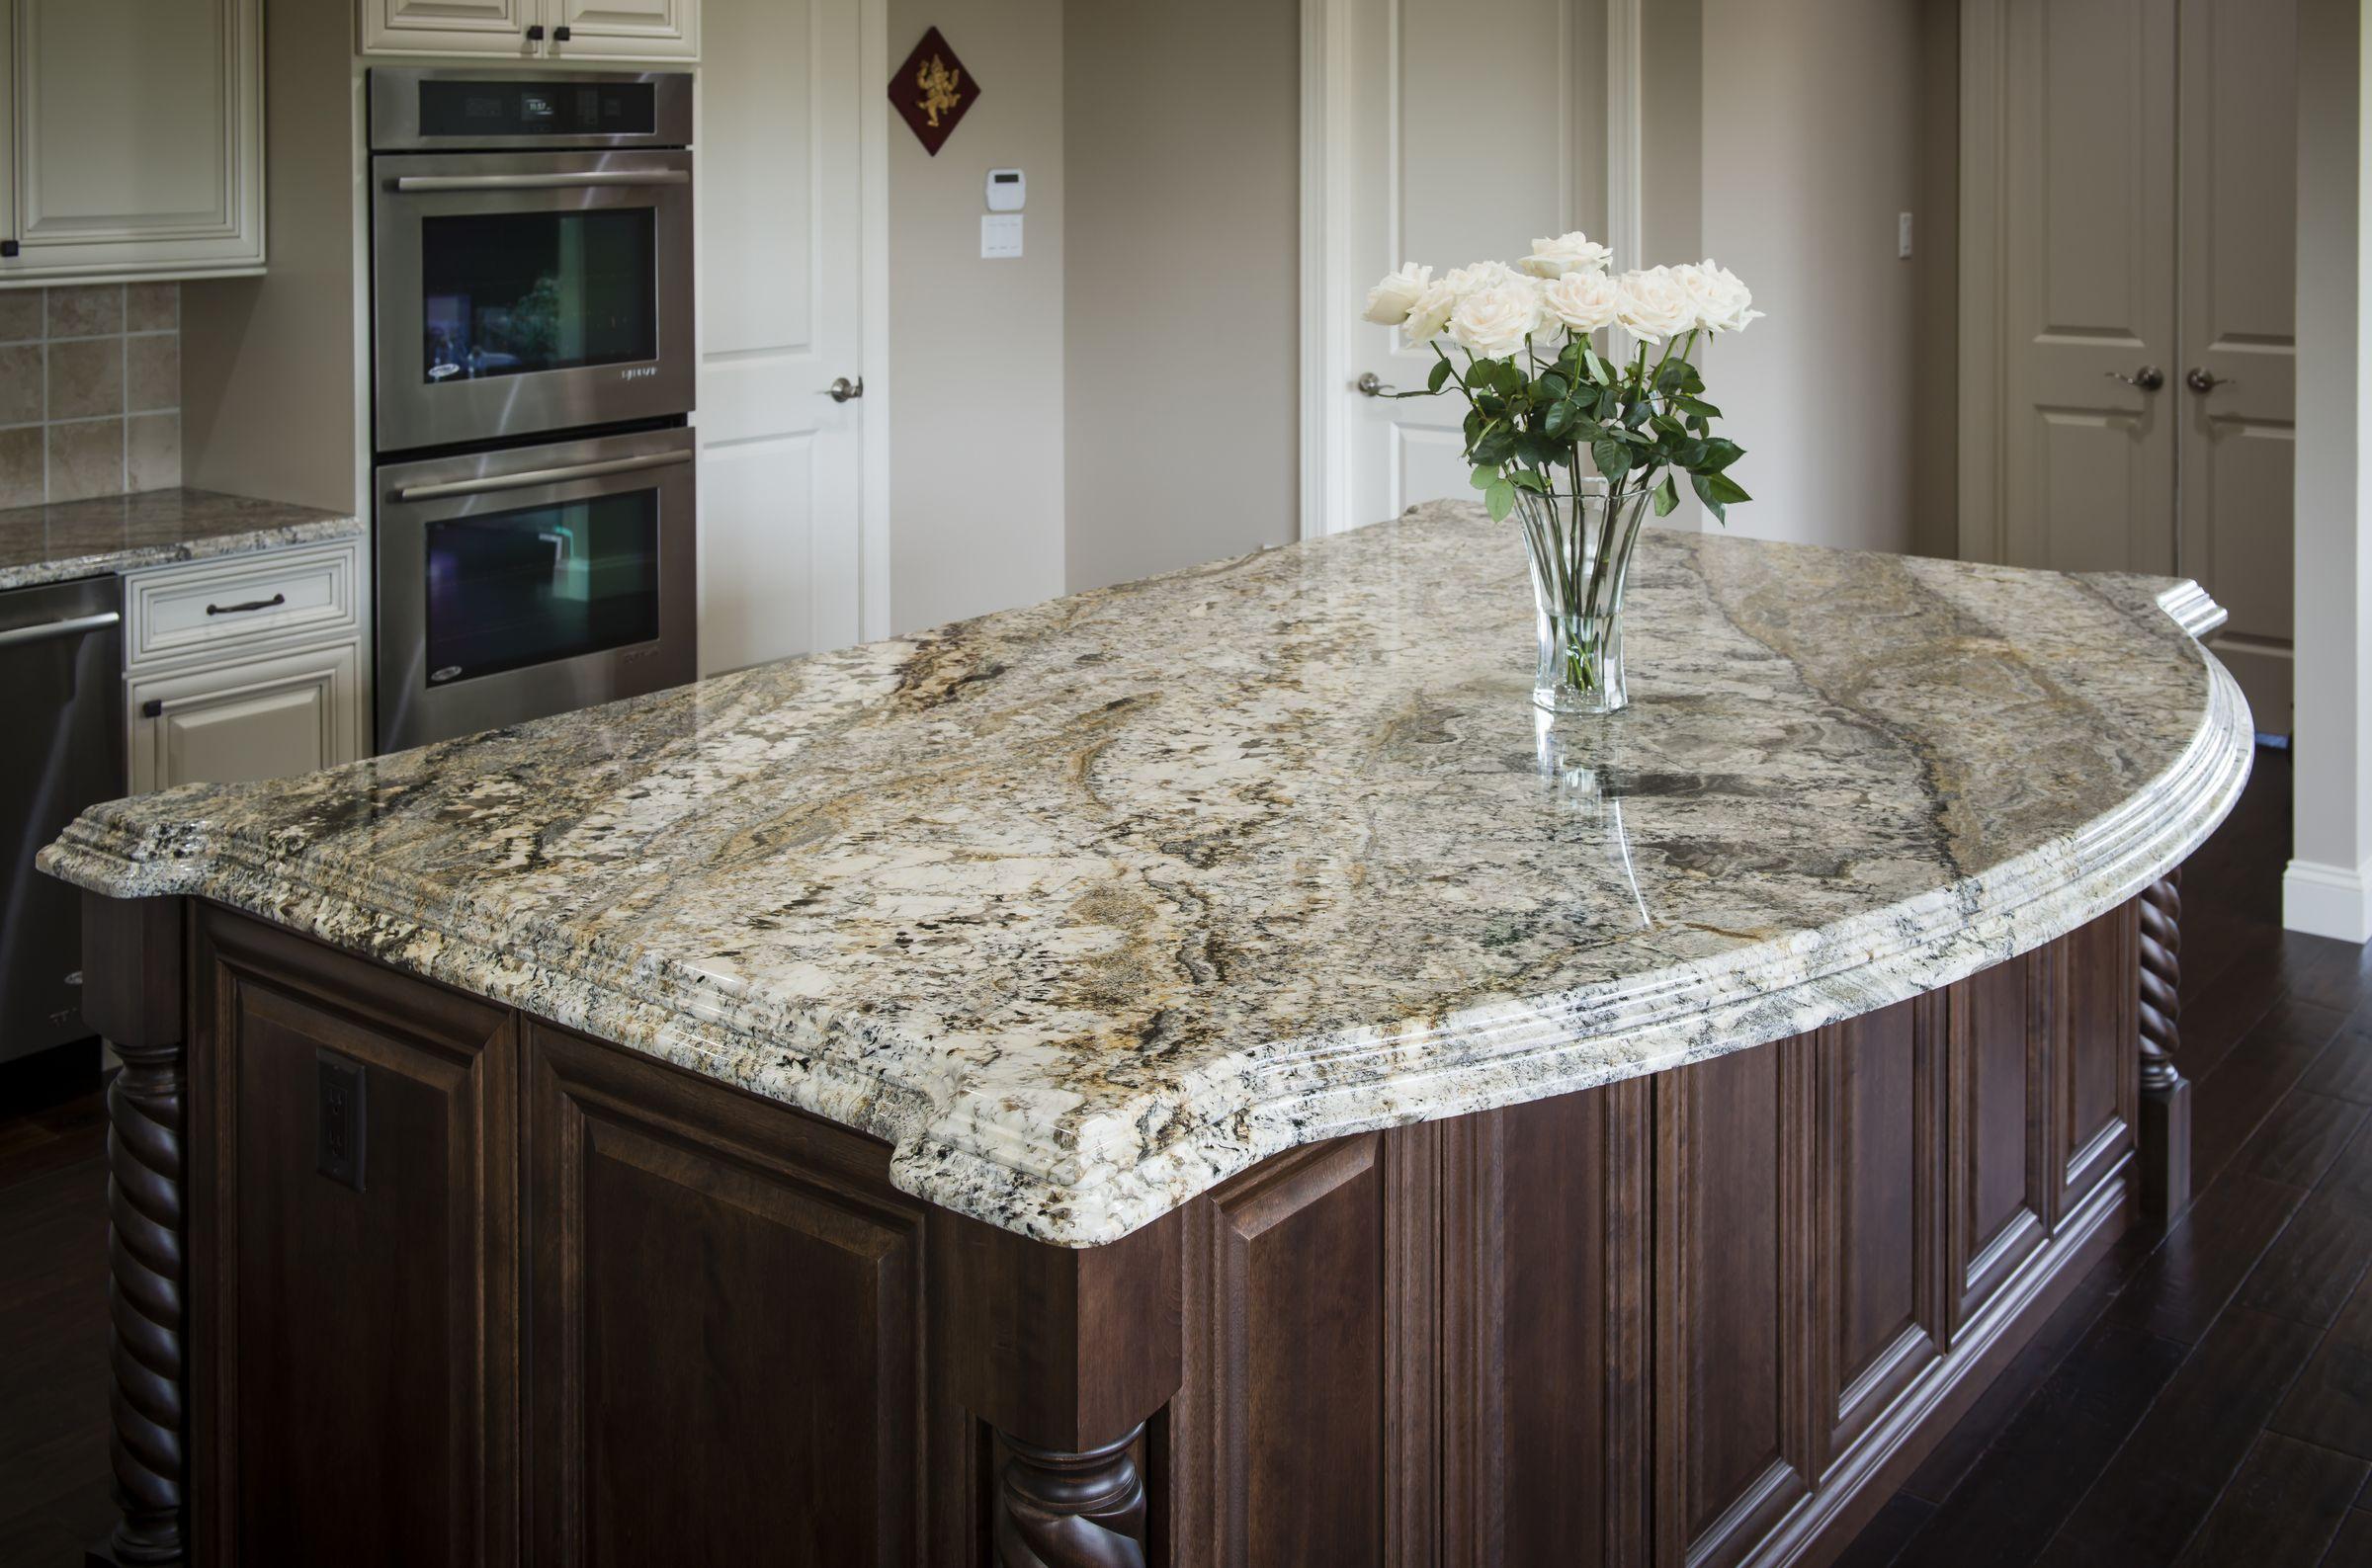 St Louis Granite Countertops - BSTCountertops